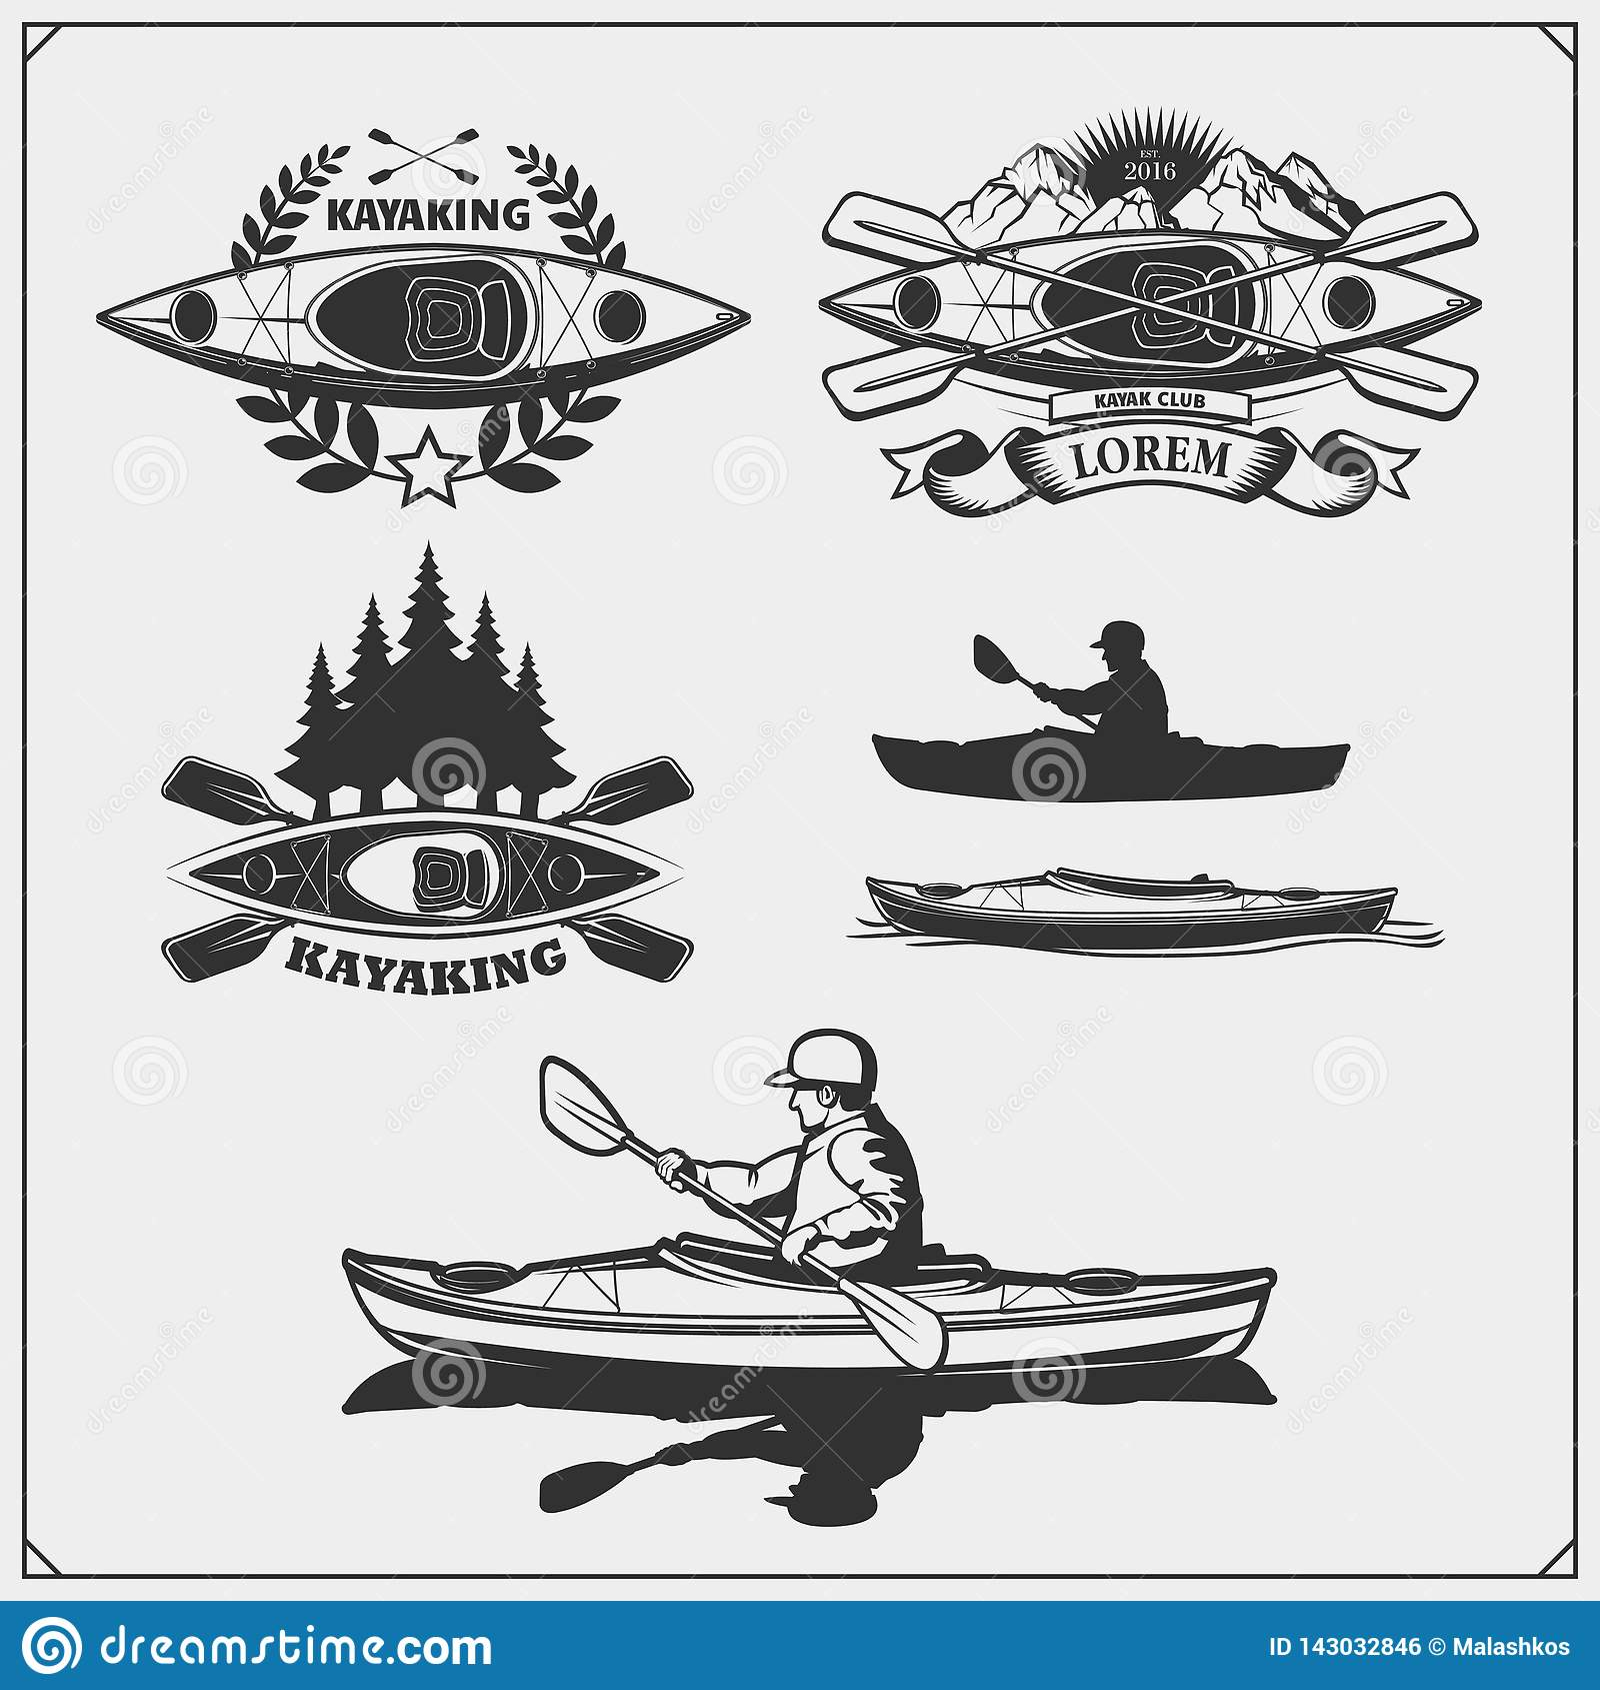 Kayak and canoe emblems, labels, badges and design elements. Print design for t-shirts.